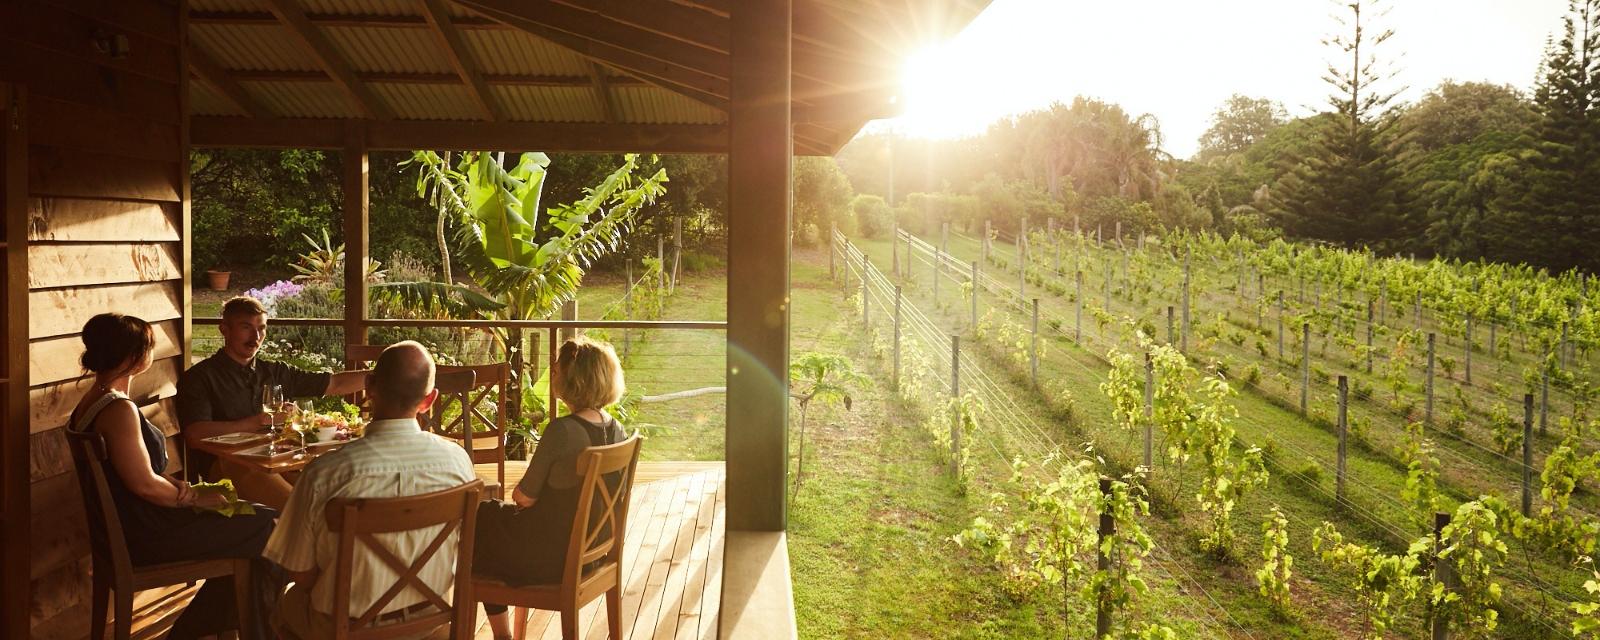 Winery business on Norfolk Island